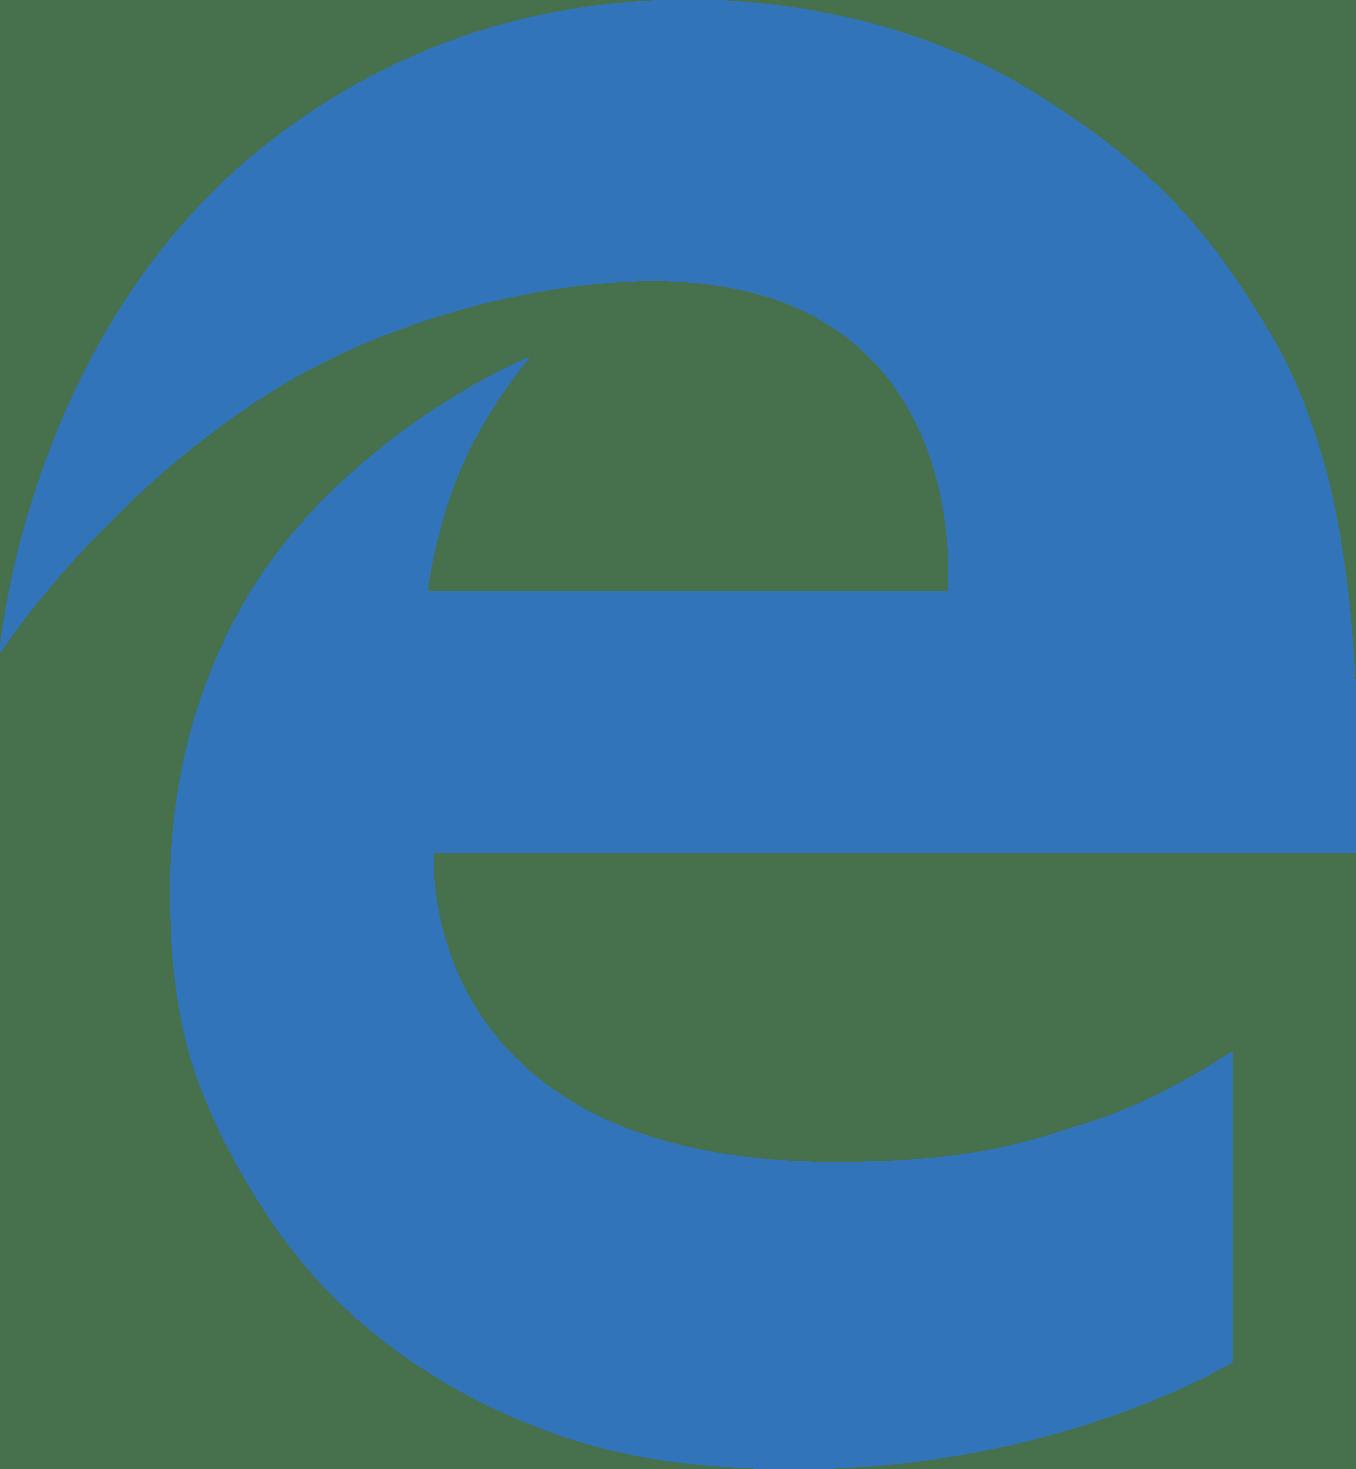 microsof-edge-logo